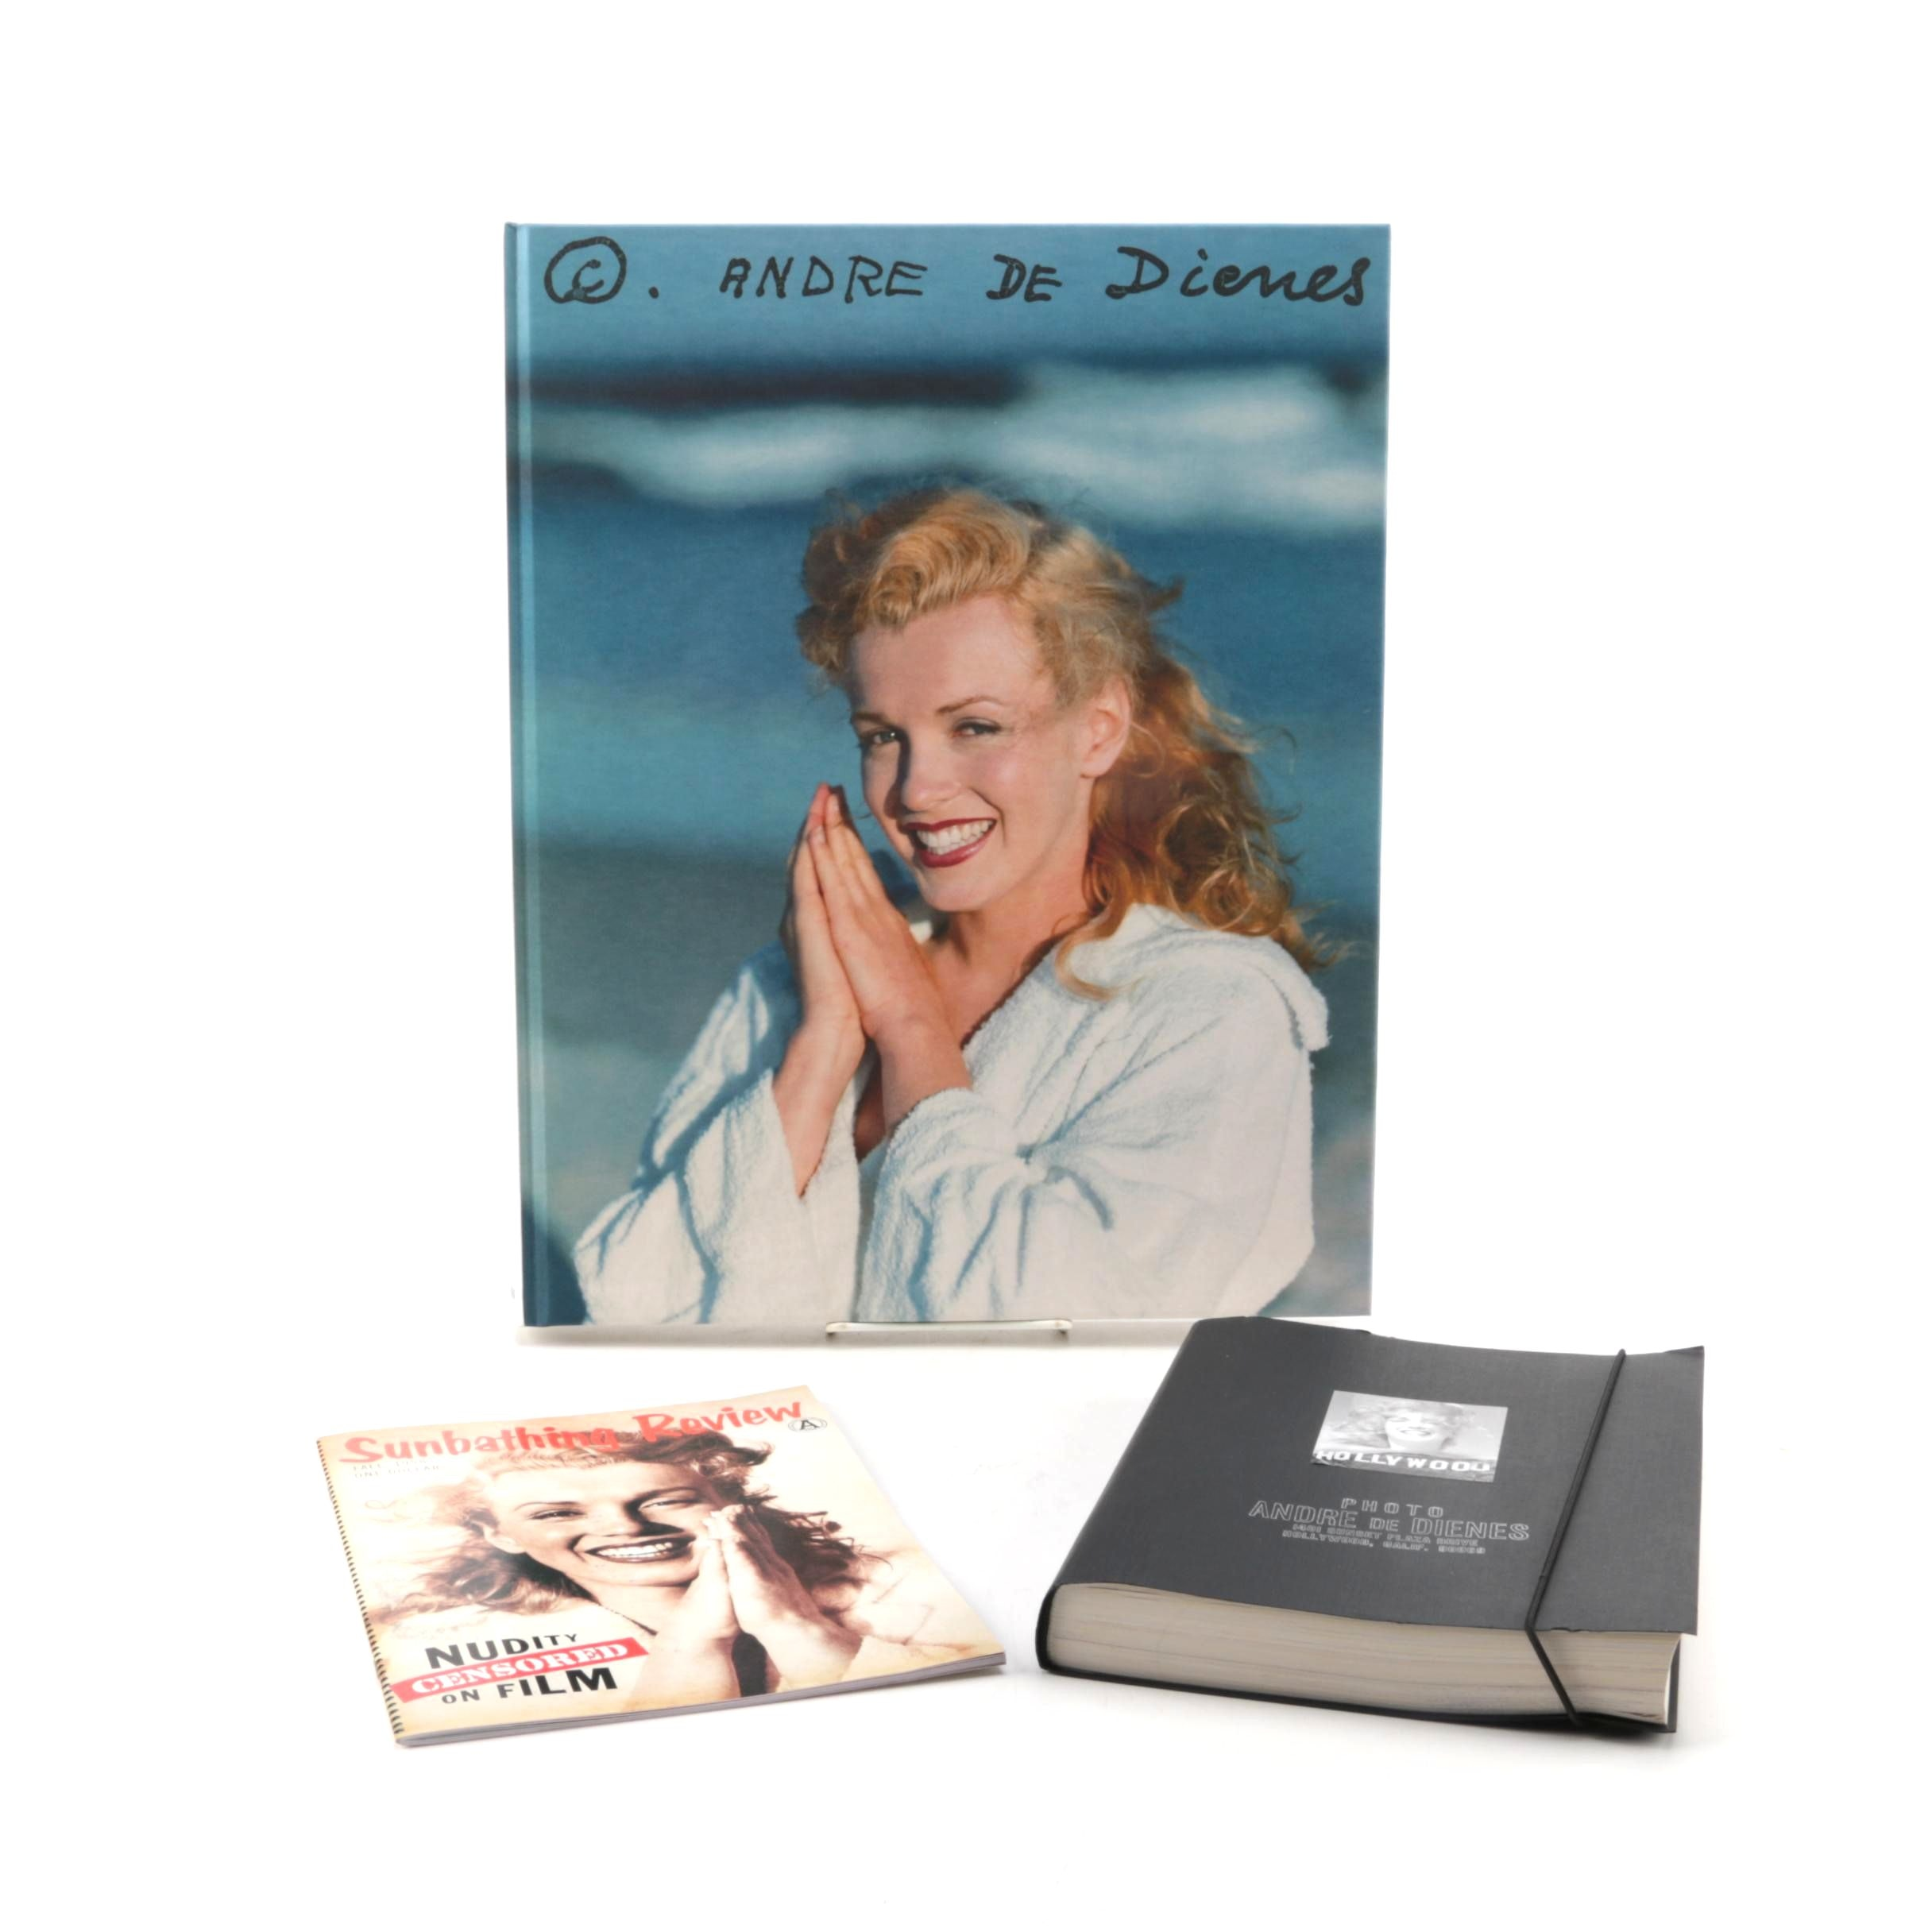 Andre de Dienes Marilyn Monroe Book and Facsimile Manuscript with Magazines